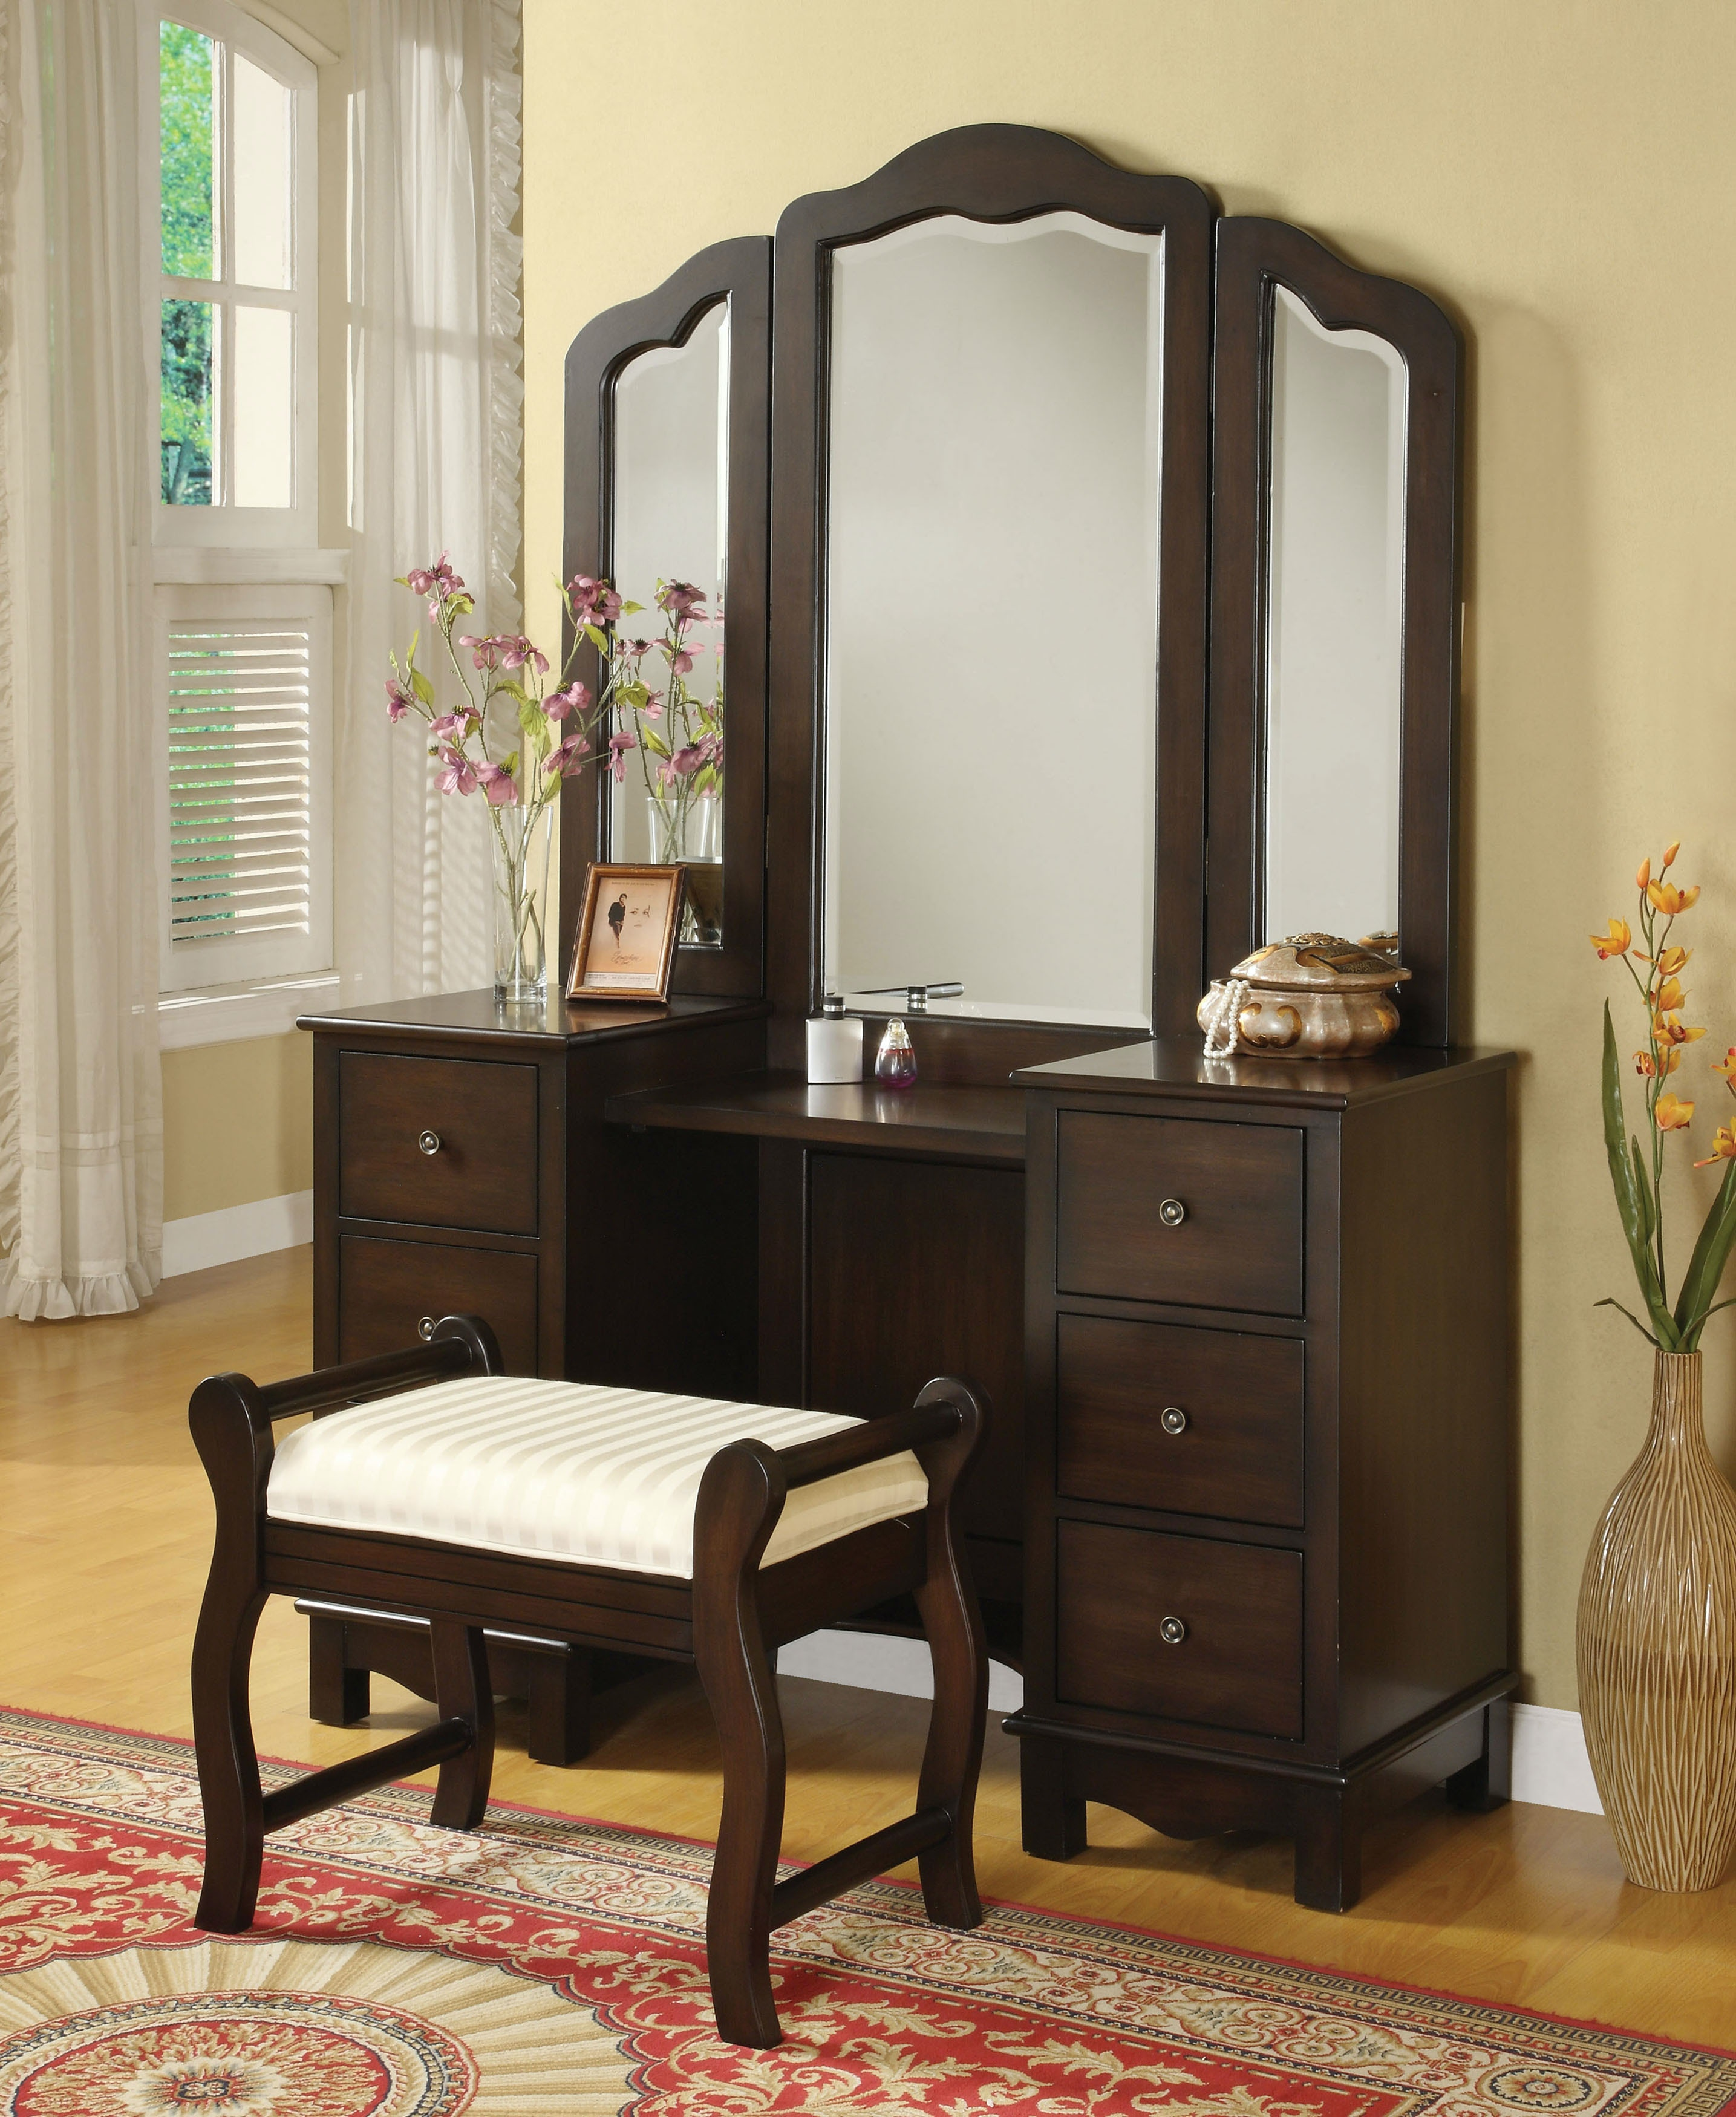 Genial Acme Furniture Annapolis Vanity Mirror 06553